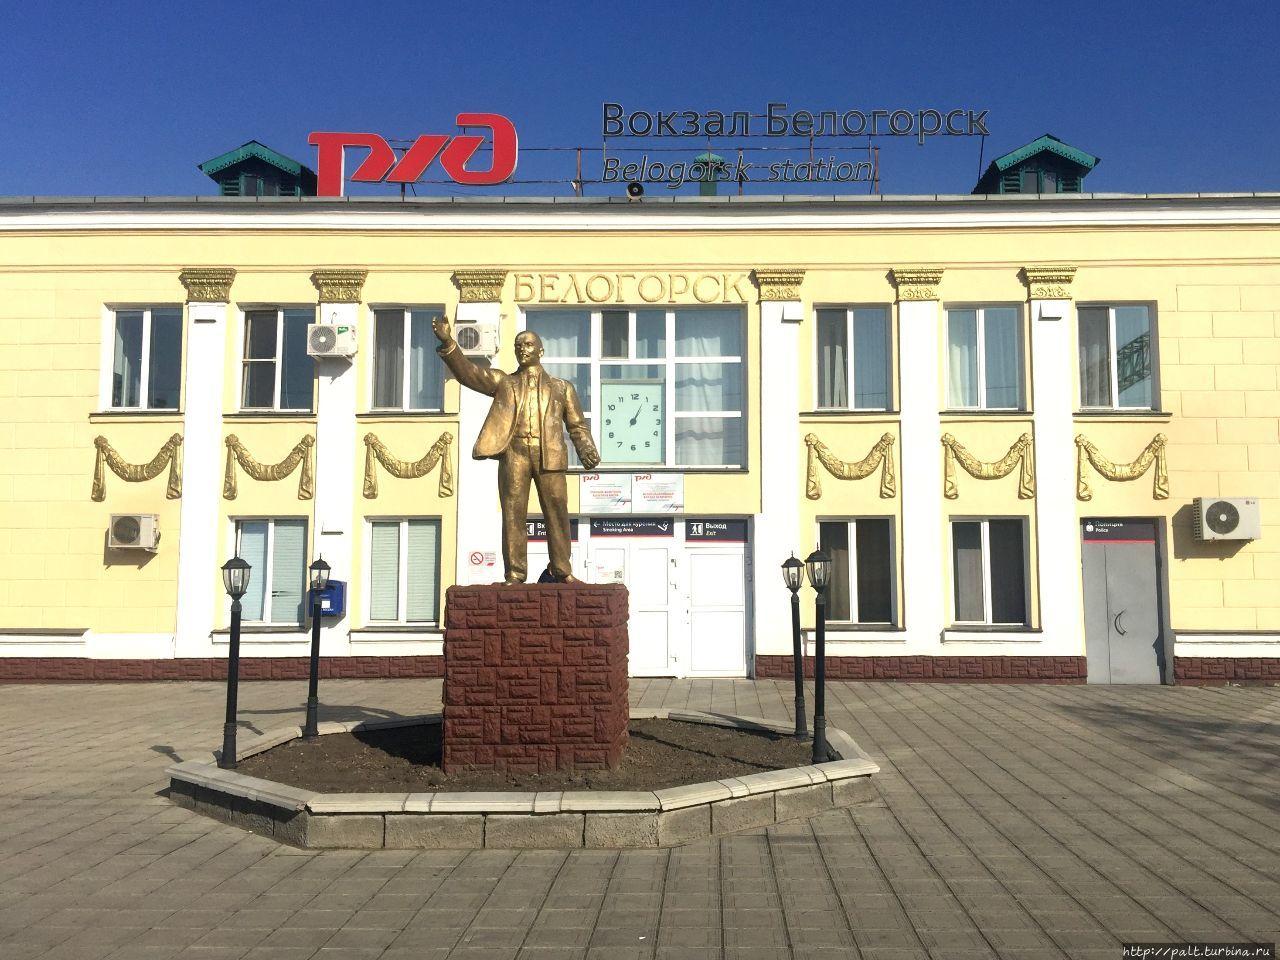 Вокзал Белогорска на мног